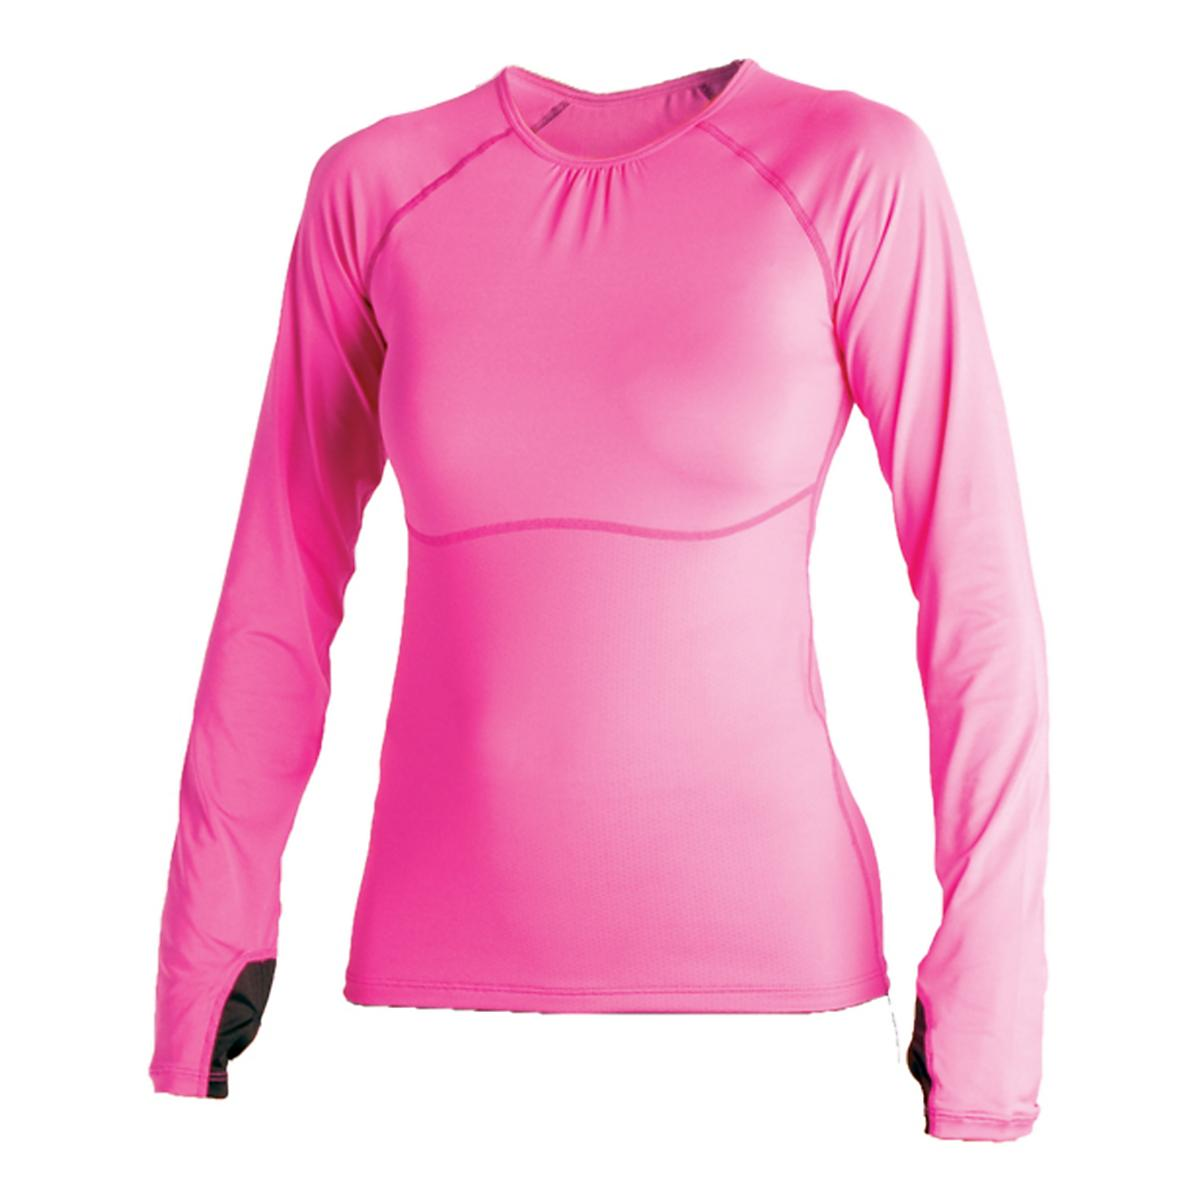 Women's Skirt Sports�Runners Dream Long Sleeve